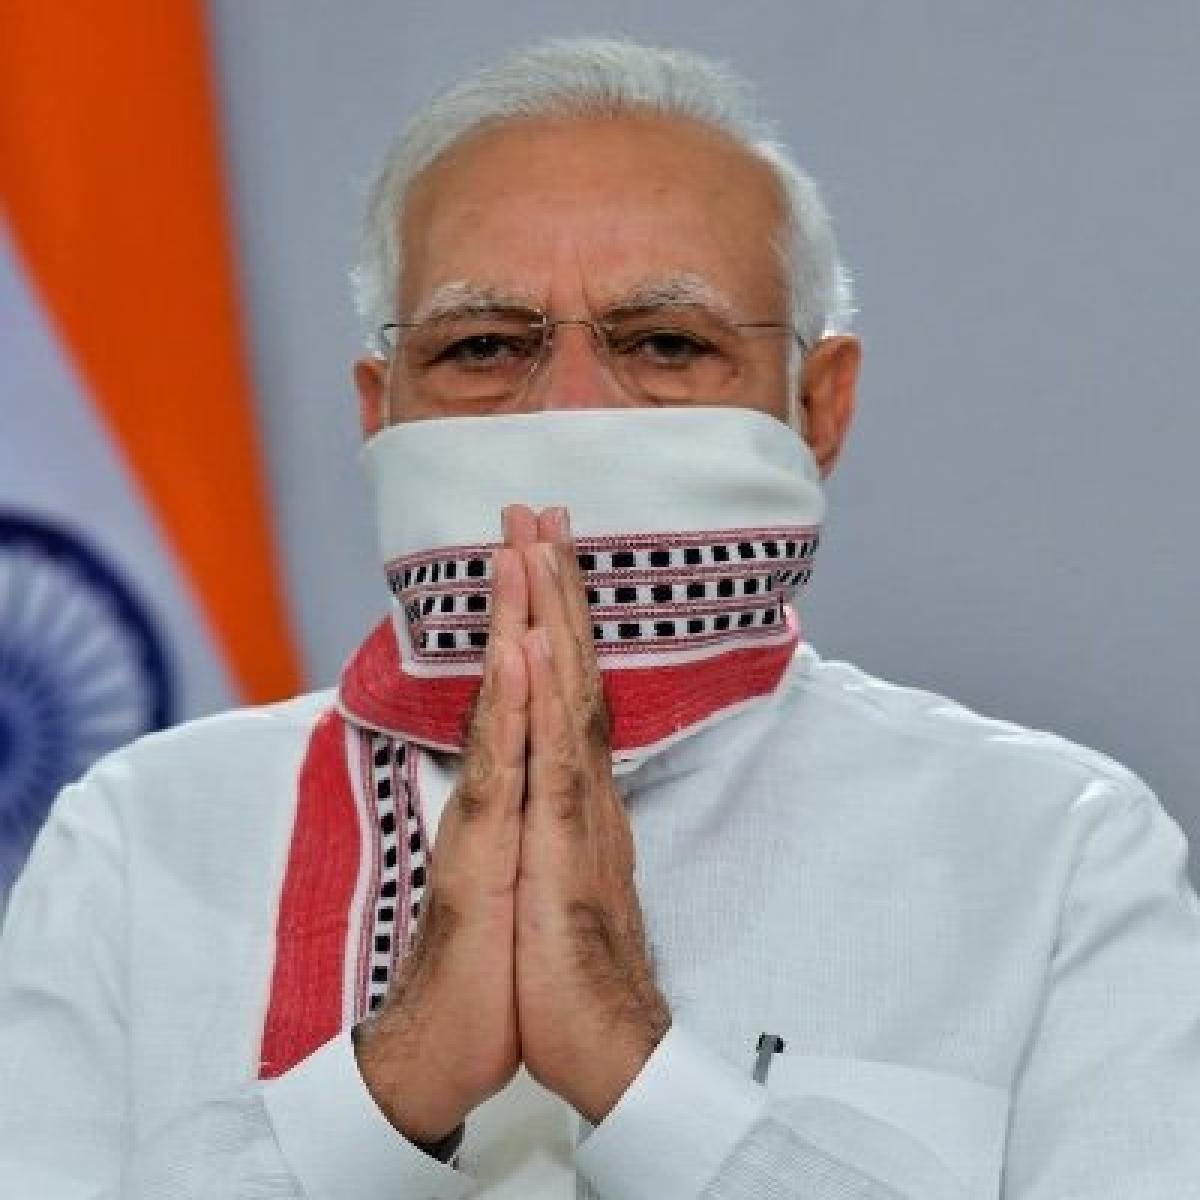 India will definitely get back its economic growth, says PM Modi charting Atma-nirbhar Bharat vision